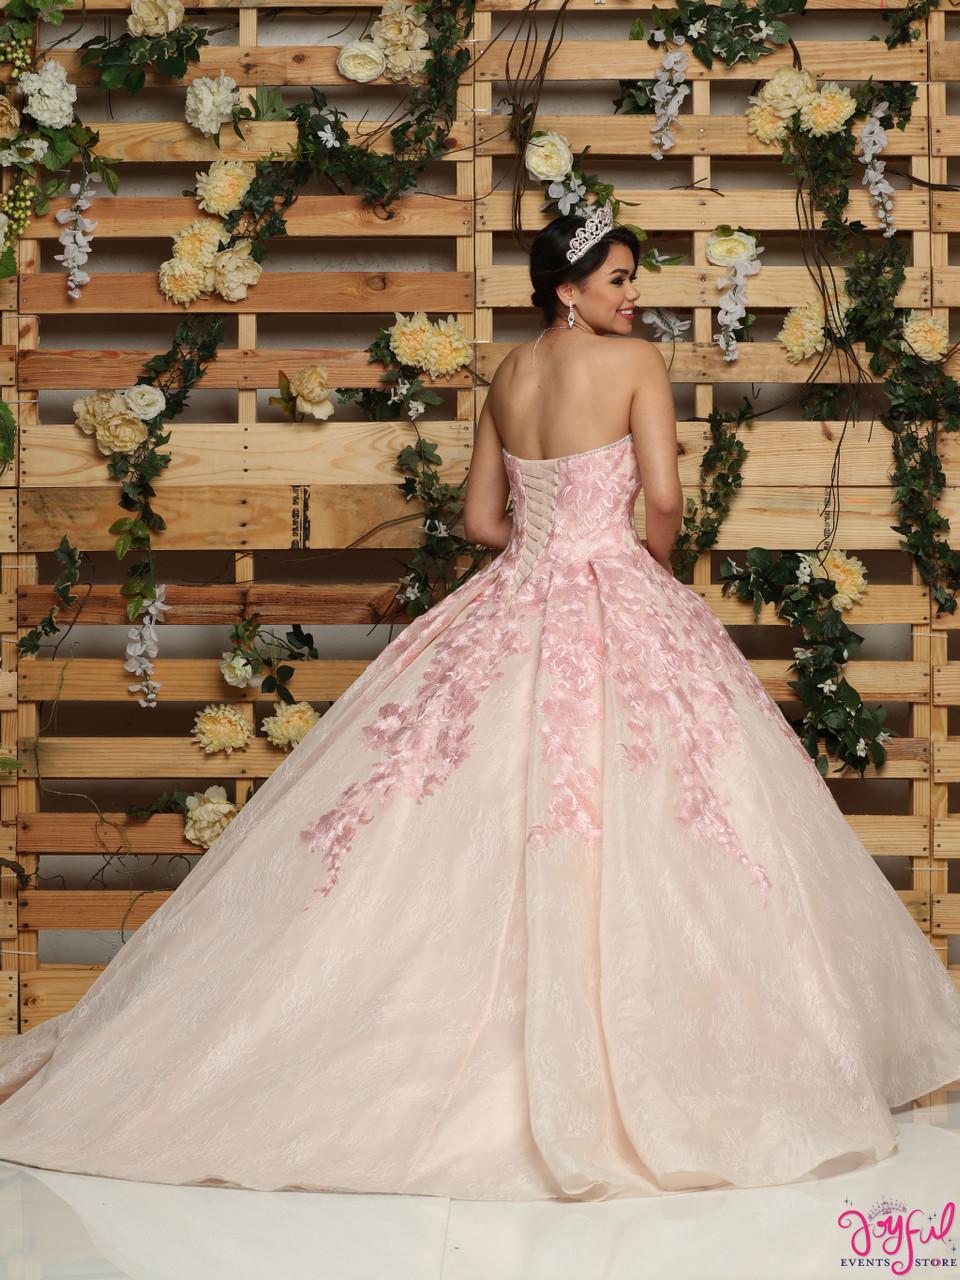 f5bd42ab573 Quinceanera Dress  80420 - Joyful Events Store